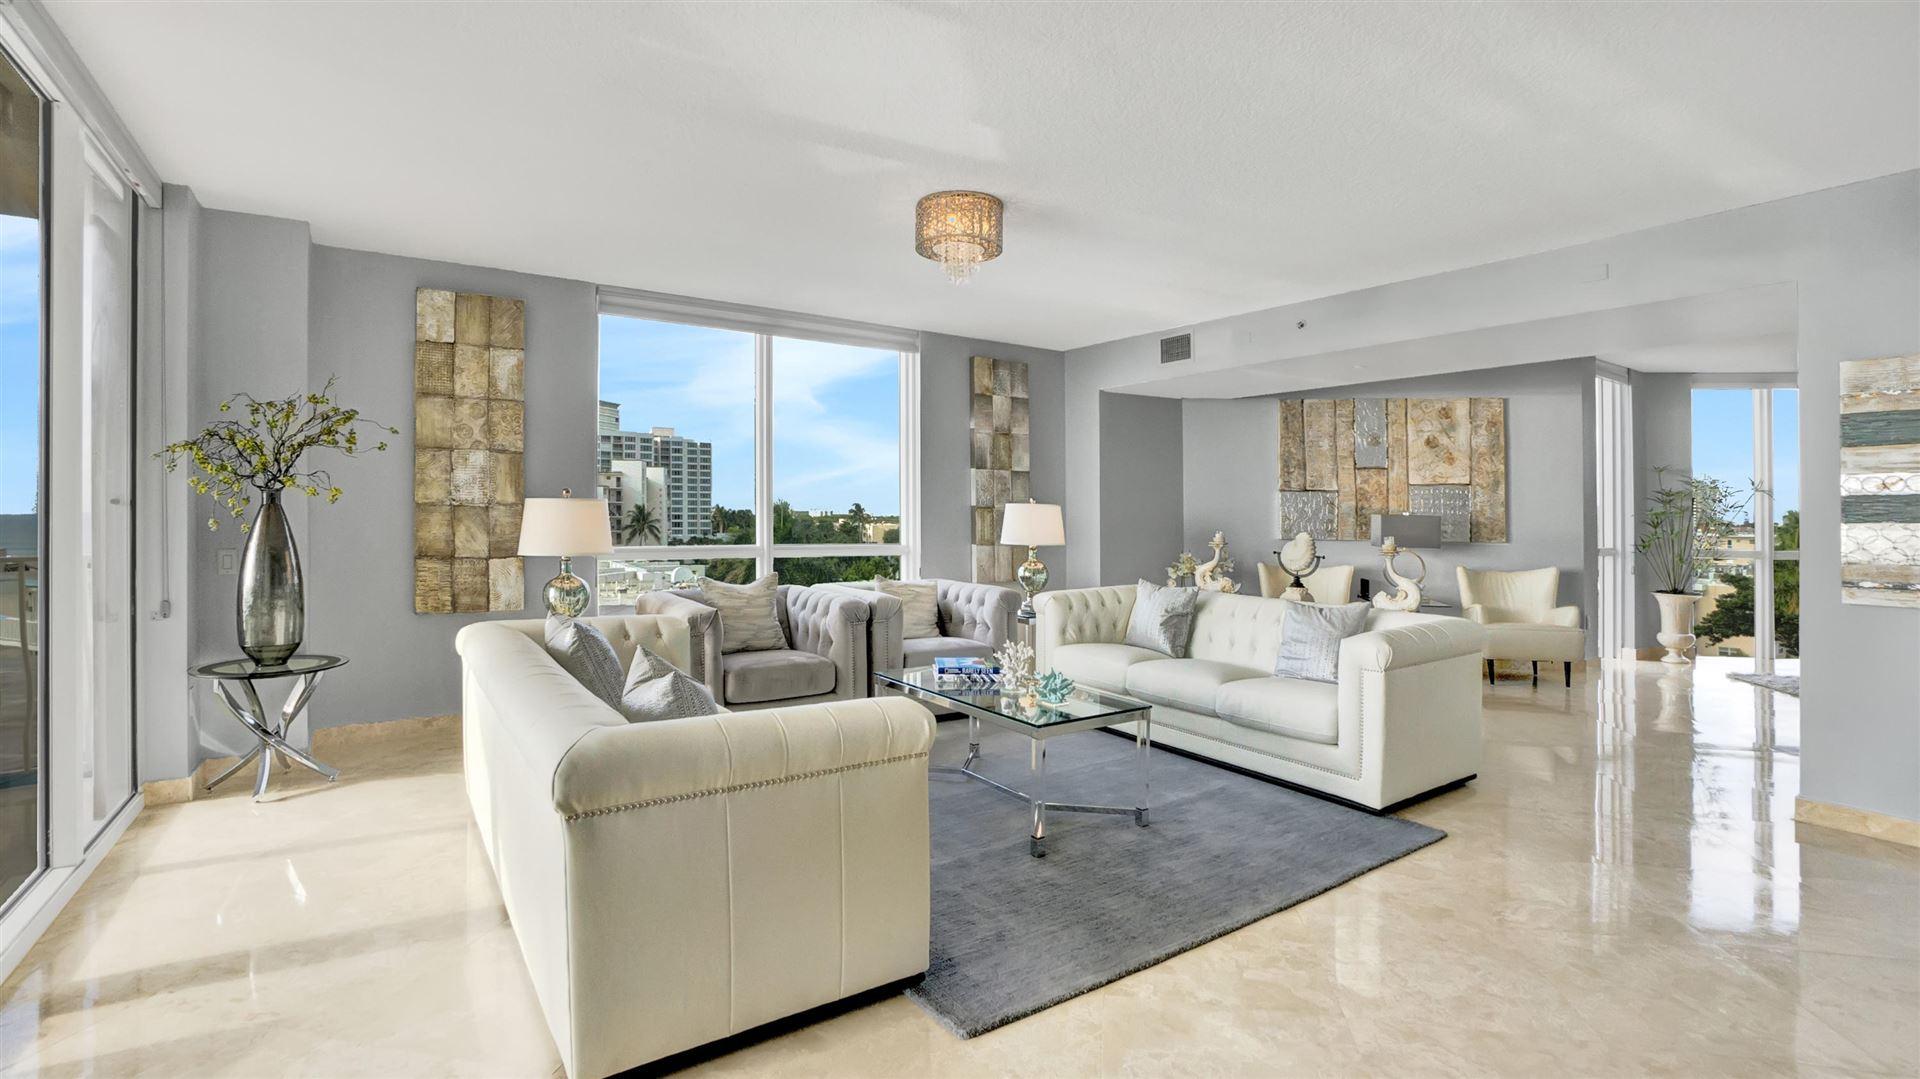 Photo of 1460 S Ocean Boulevard #501, Lauderdale By The Sea, FL 33062 (MLS # RX-10690250)